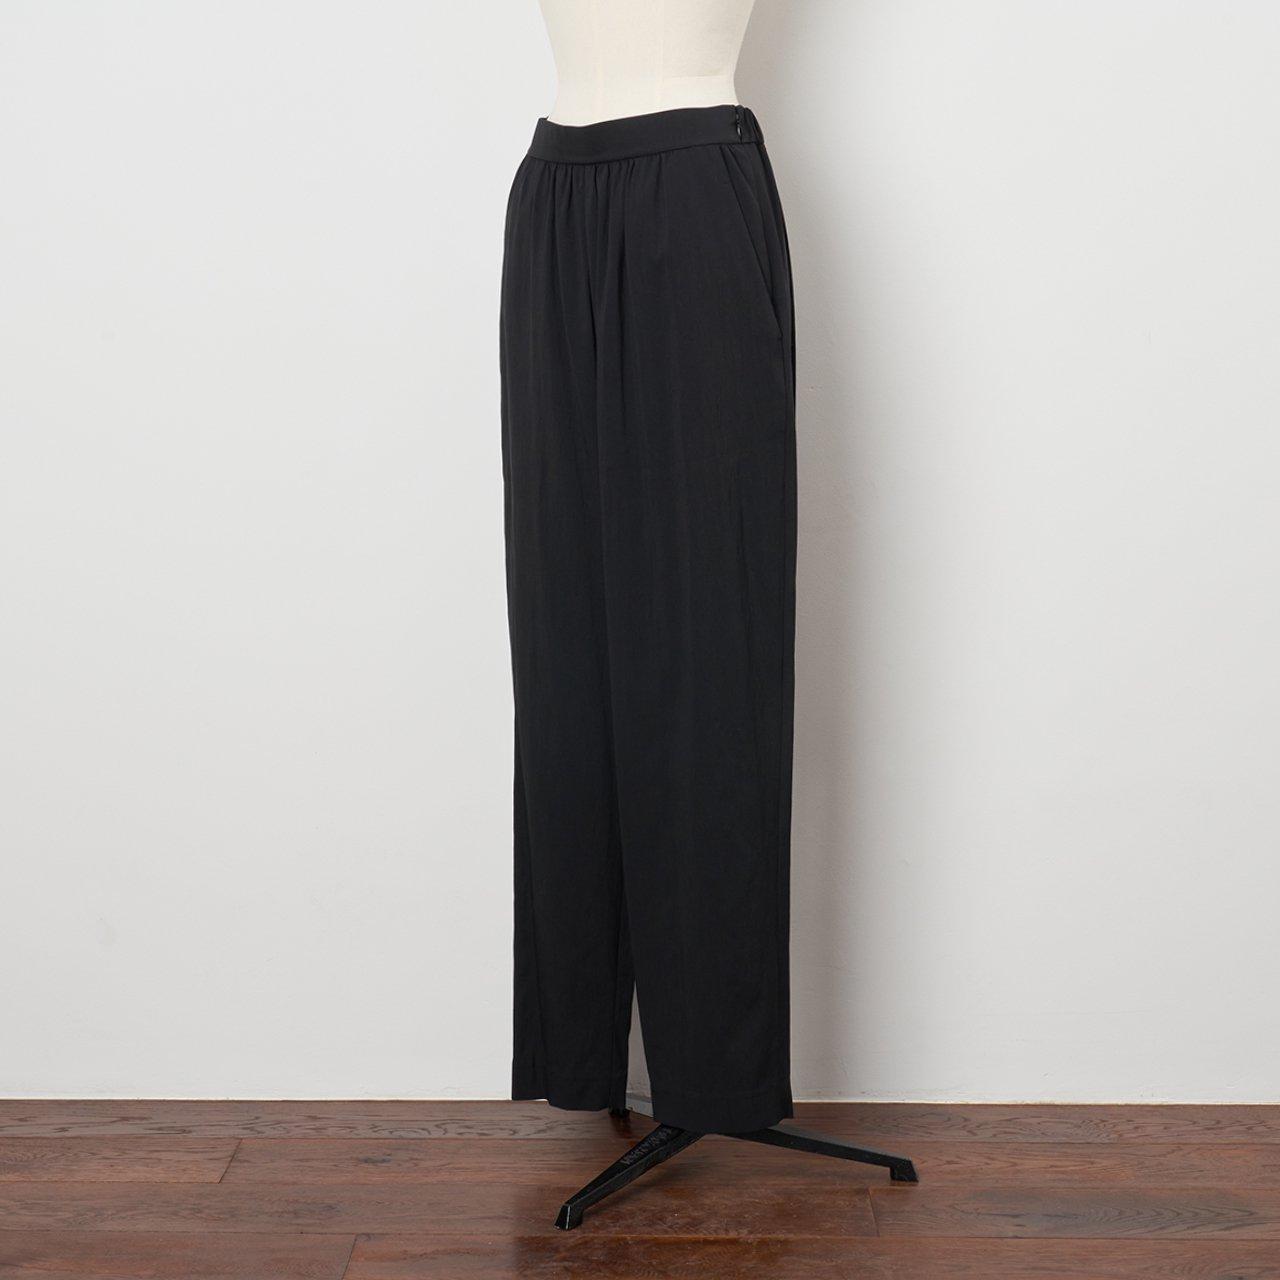 Pale Jute <BR>basic gather pants<BR>black